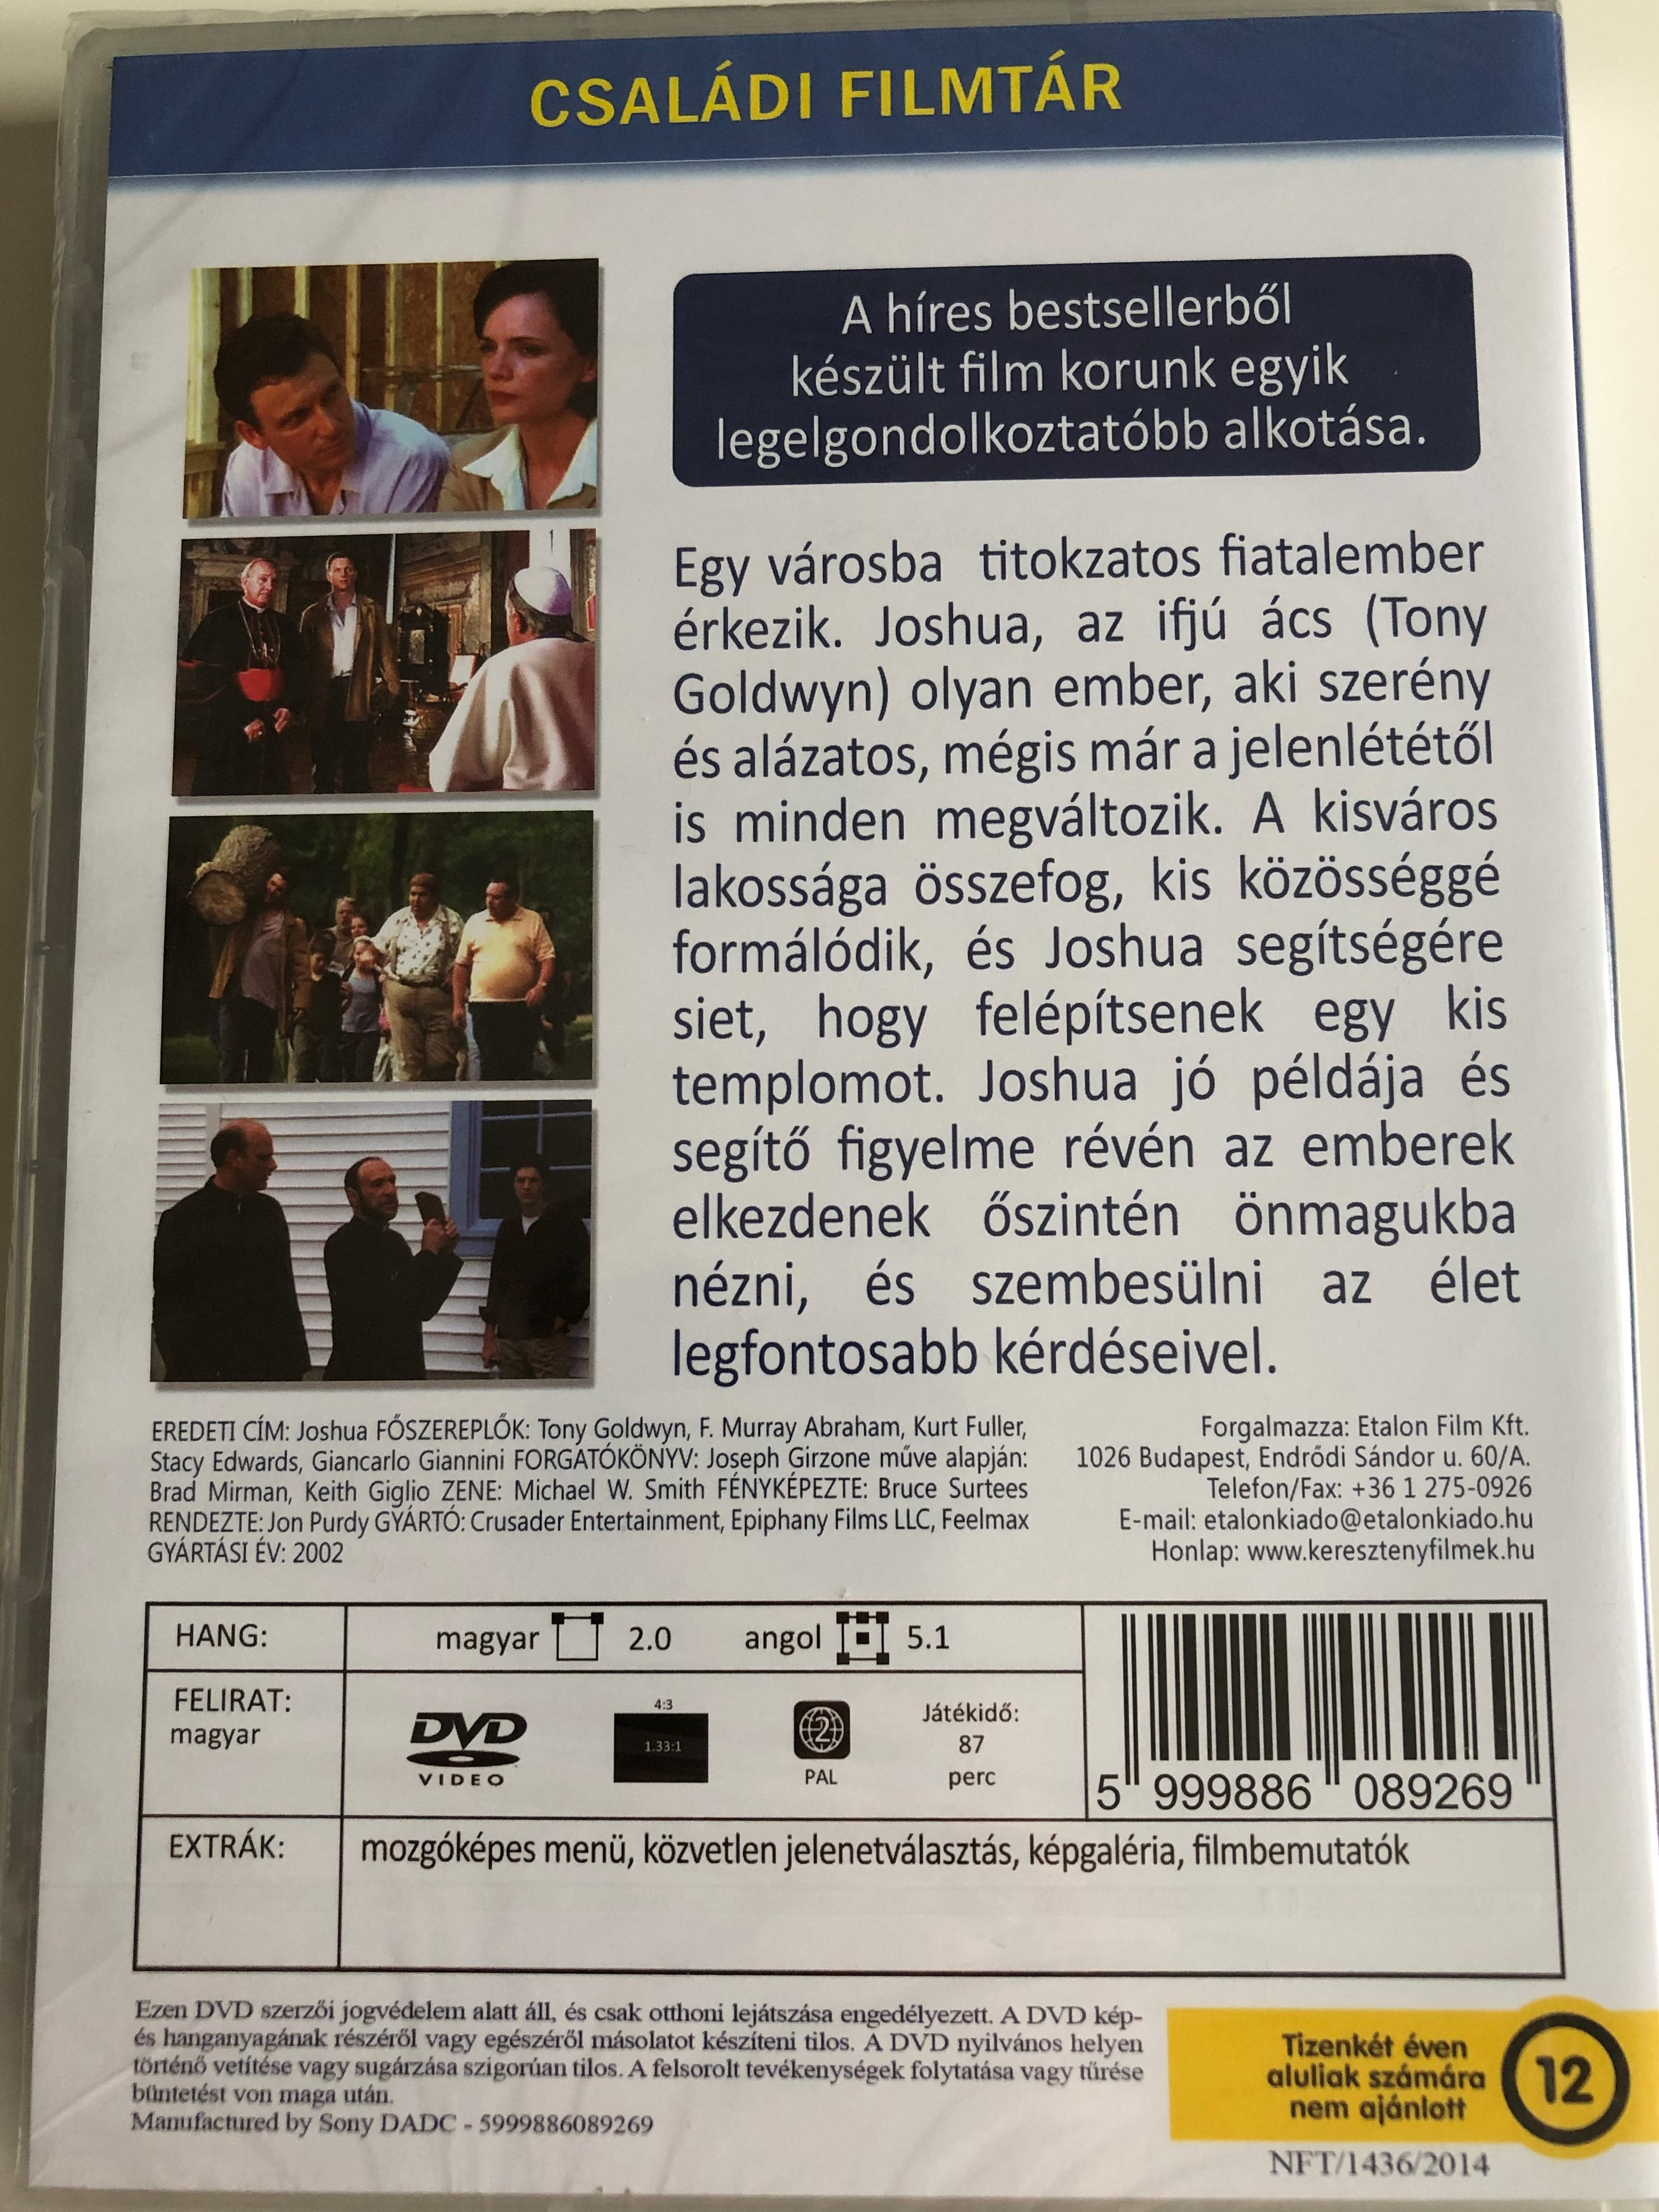 joshua-dvd-2002-directed-by-jon-purdy-starring-tony-goldwyn-f.-murray-abraham-giancarlo-giannini-2-.jpg